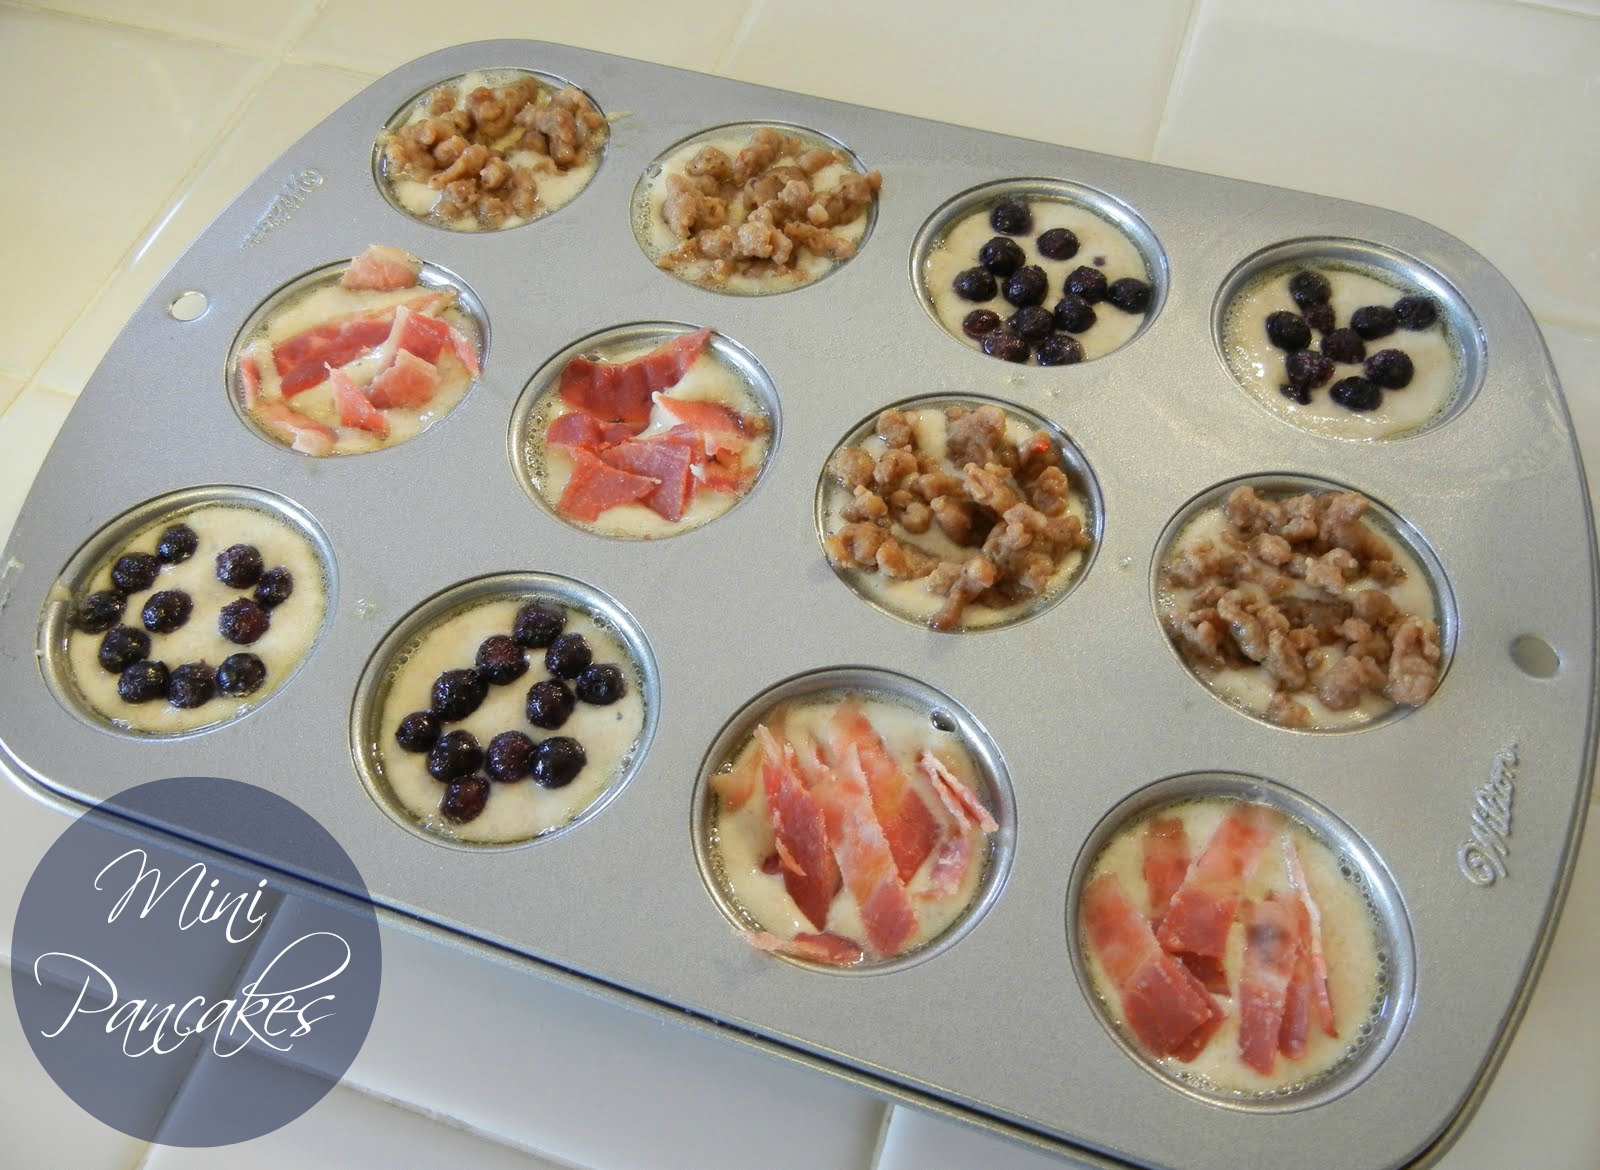 Creative dessert presentation ideas | Foodie | Pinterest ... |Individual Ice Cream Cups Gfs